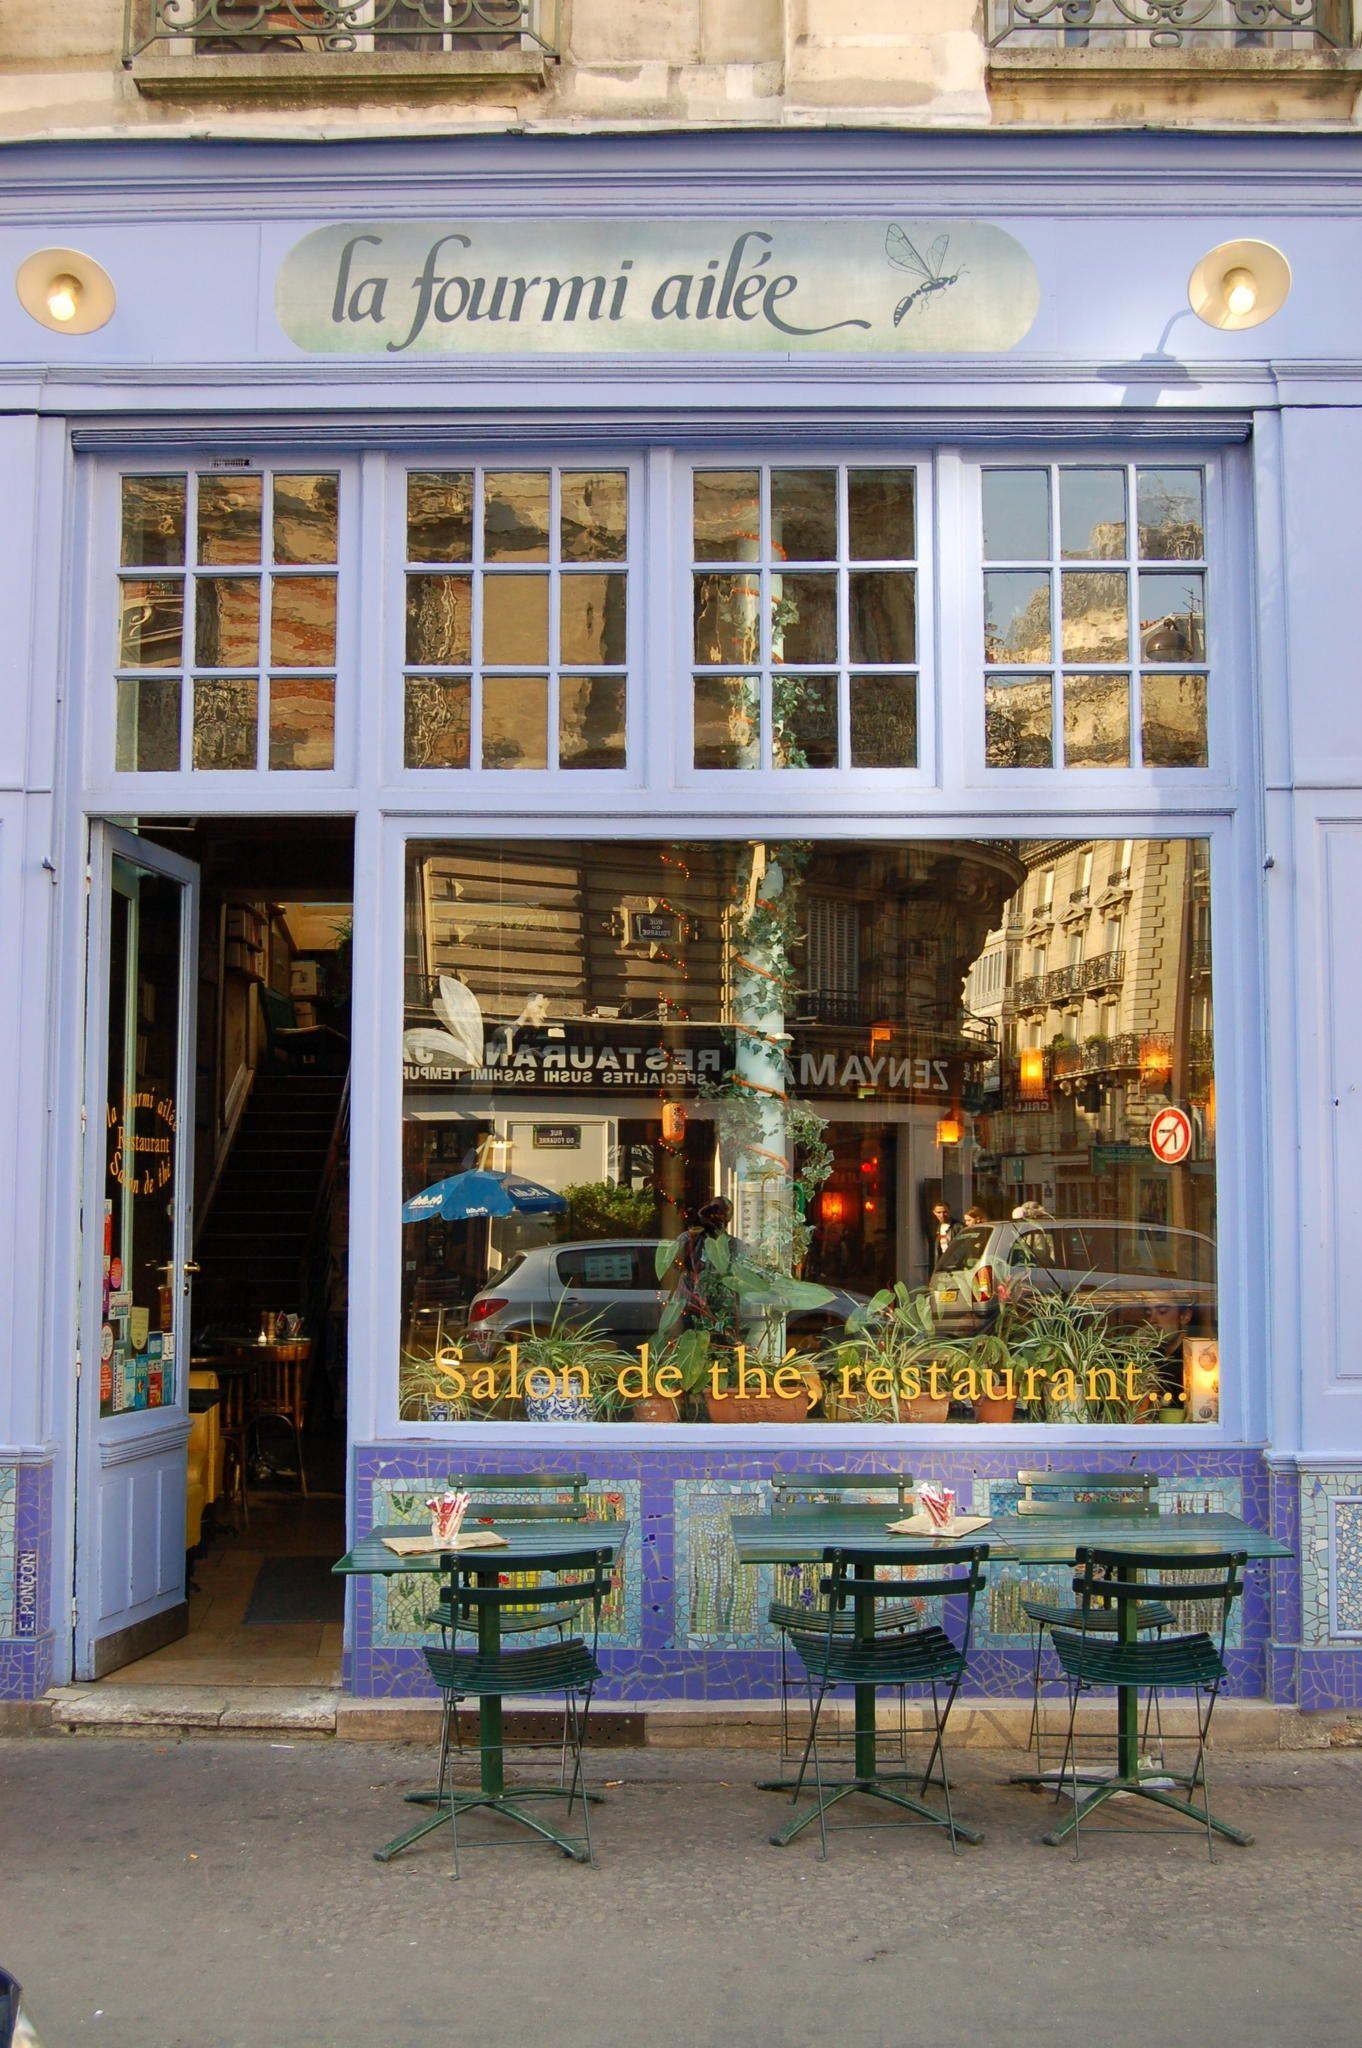 A Coffee Shop in Paris - France